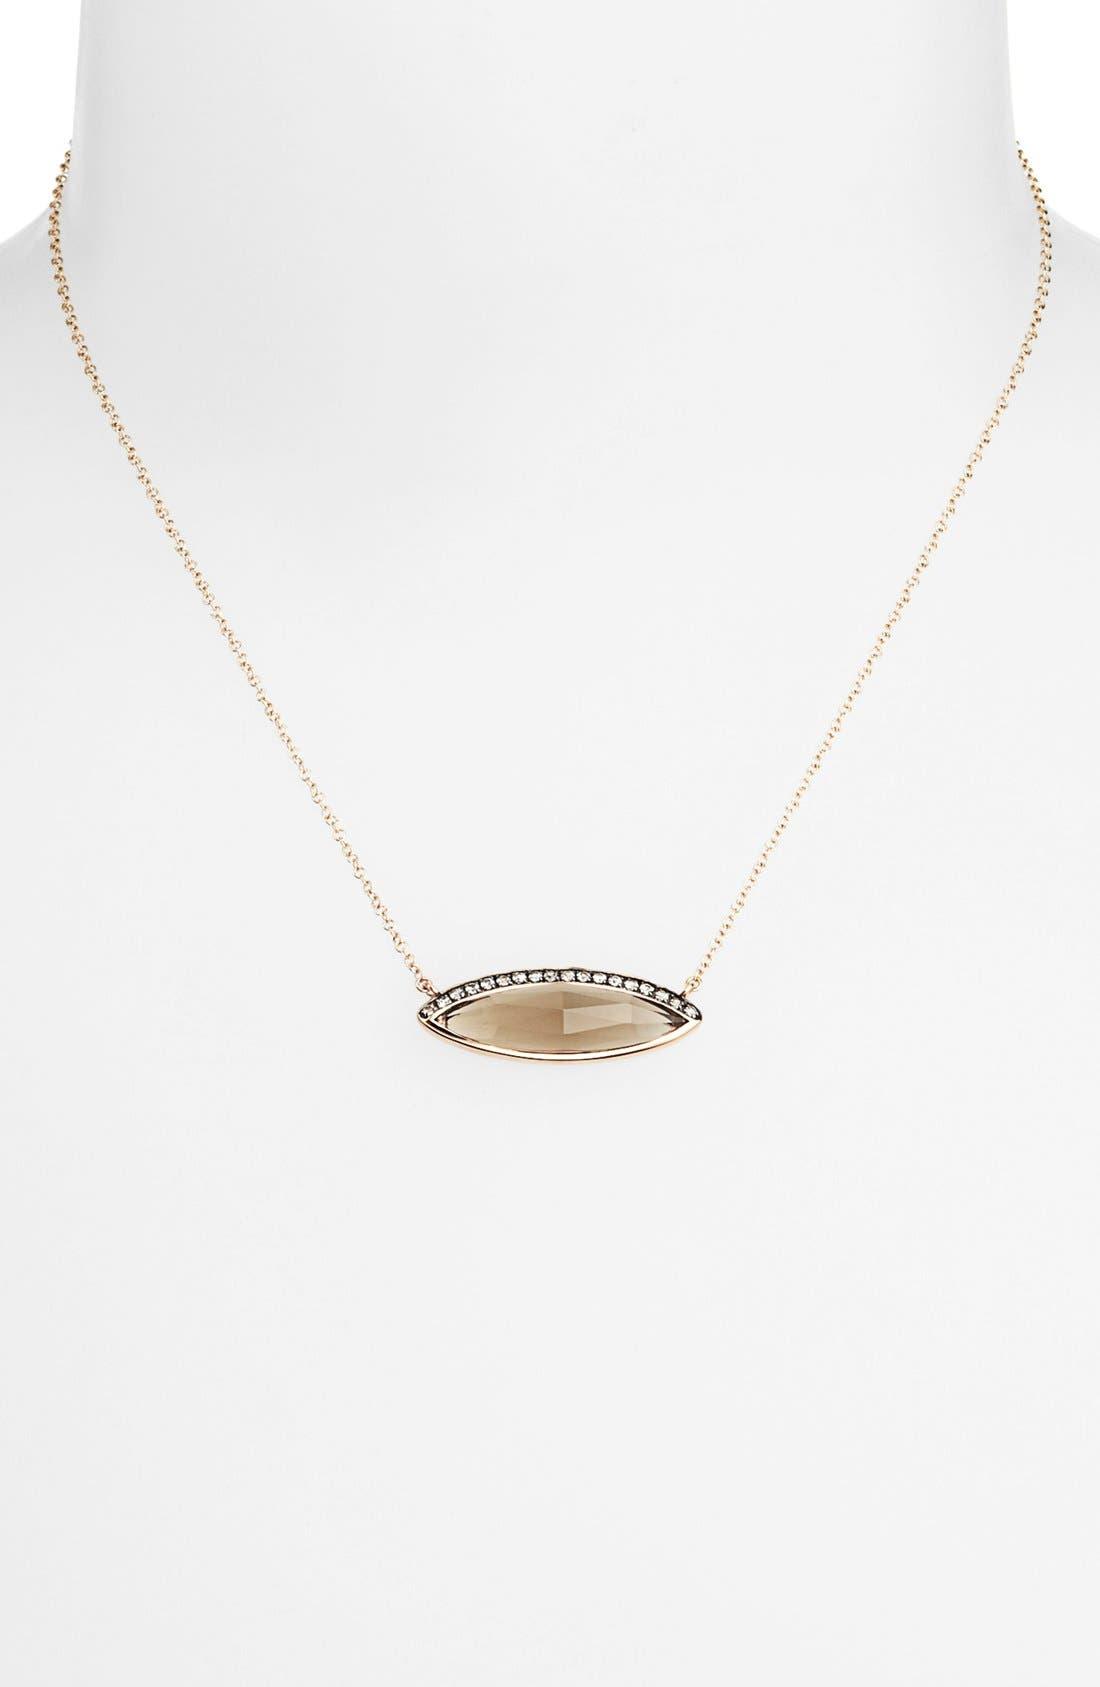 Main Image - Whitney Stern Pendant Necklace